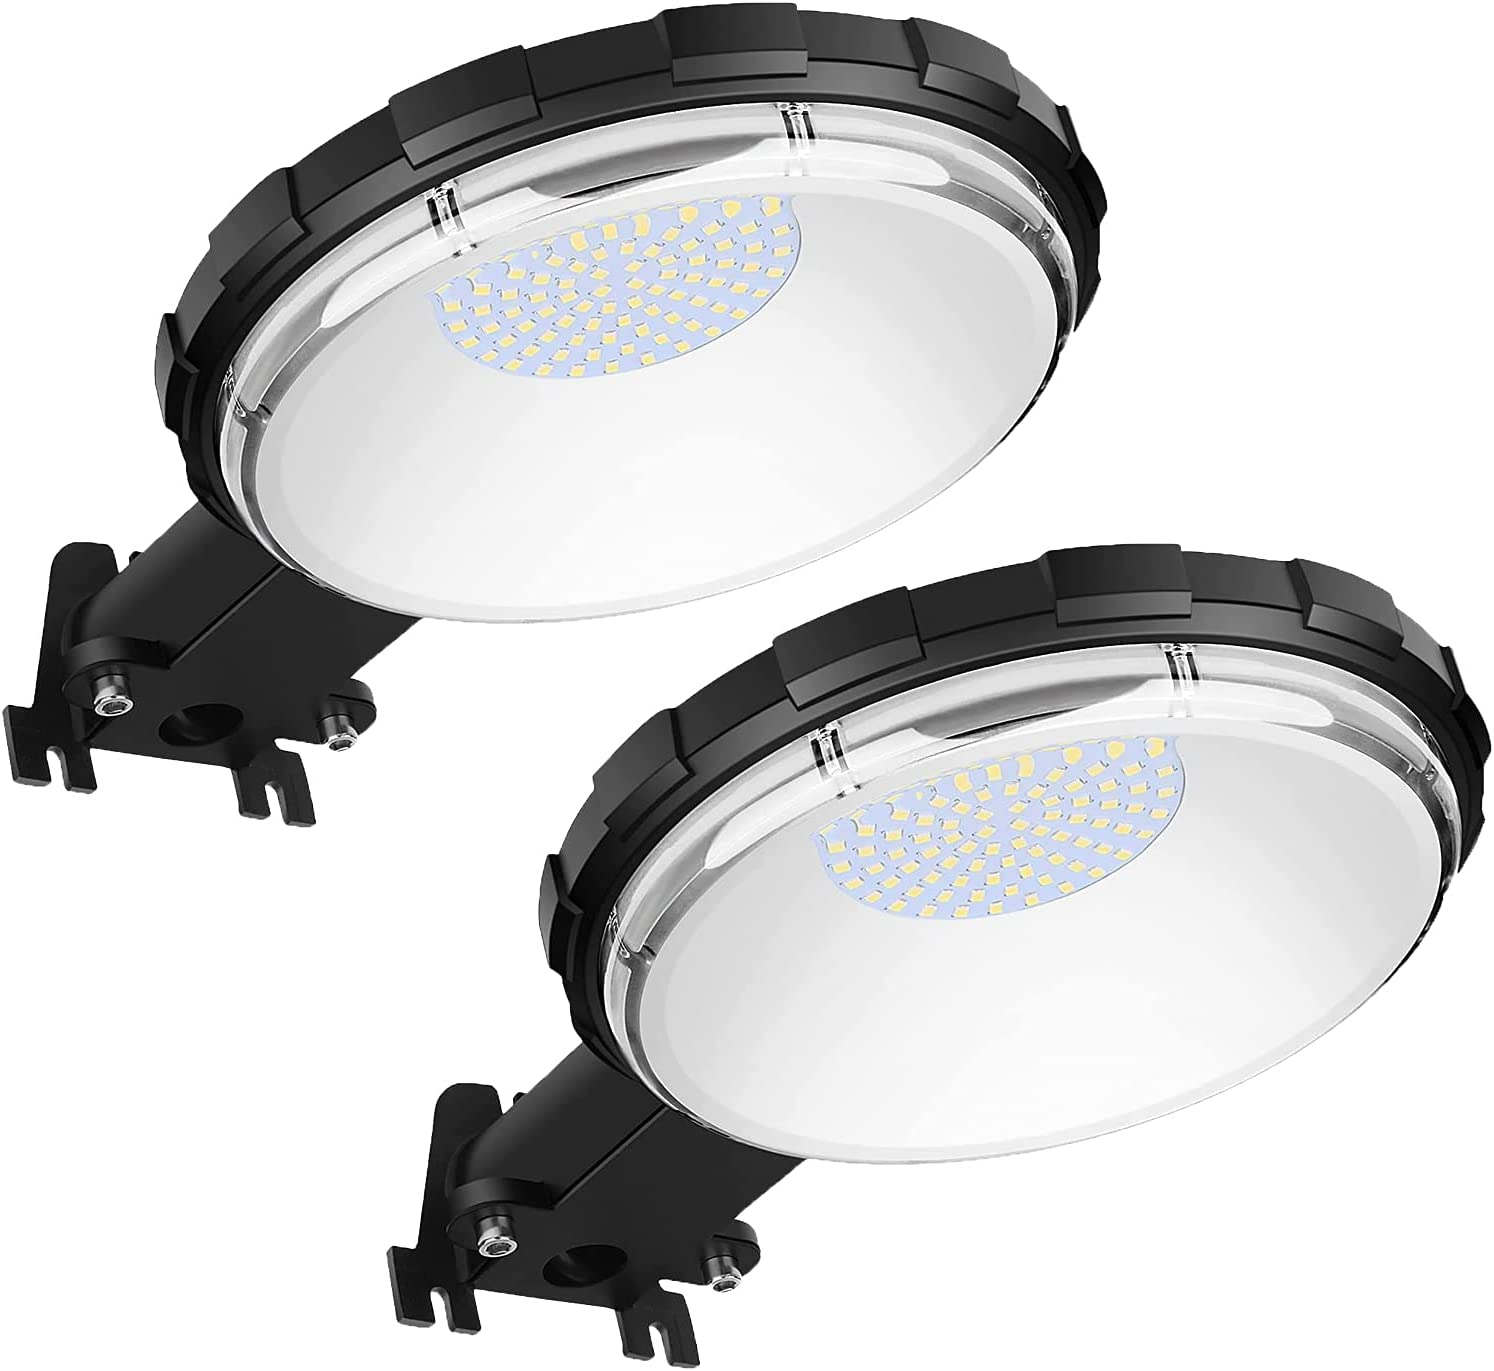 Karjoefar 100W 35% OFF LED Regular discount Barn Light 10000lm to Dawn Ligh Dusk Outdoor